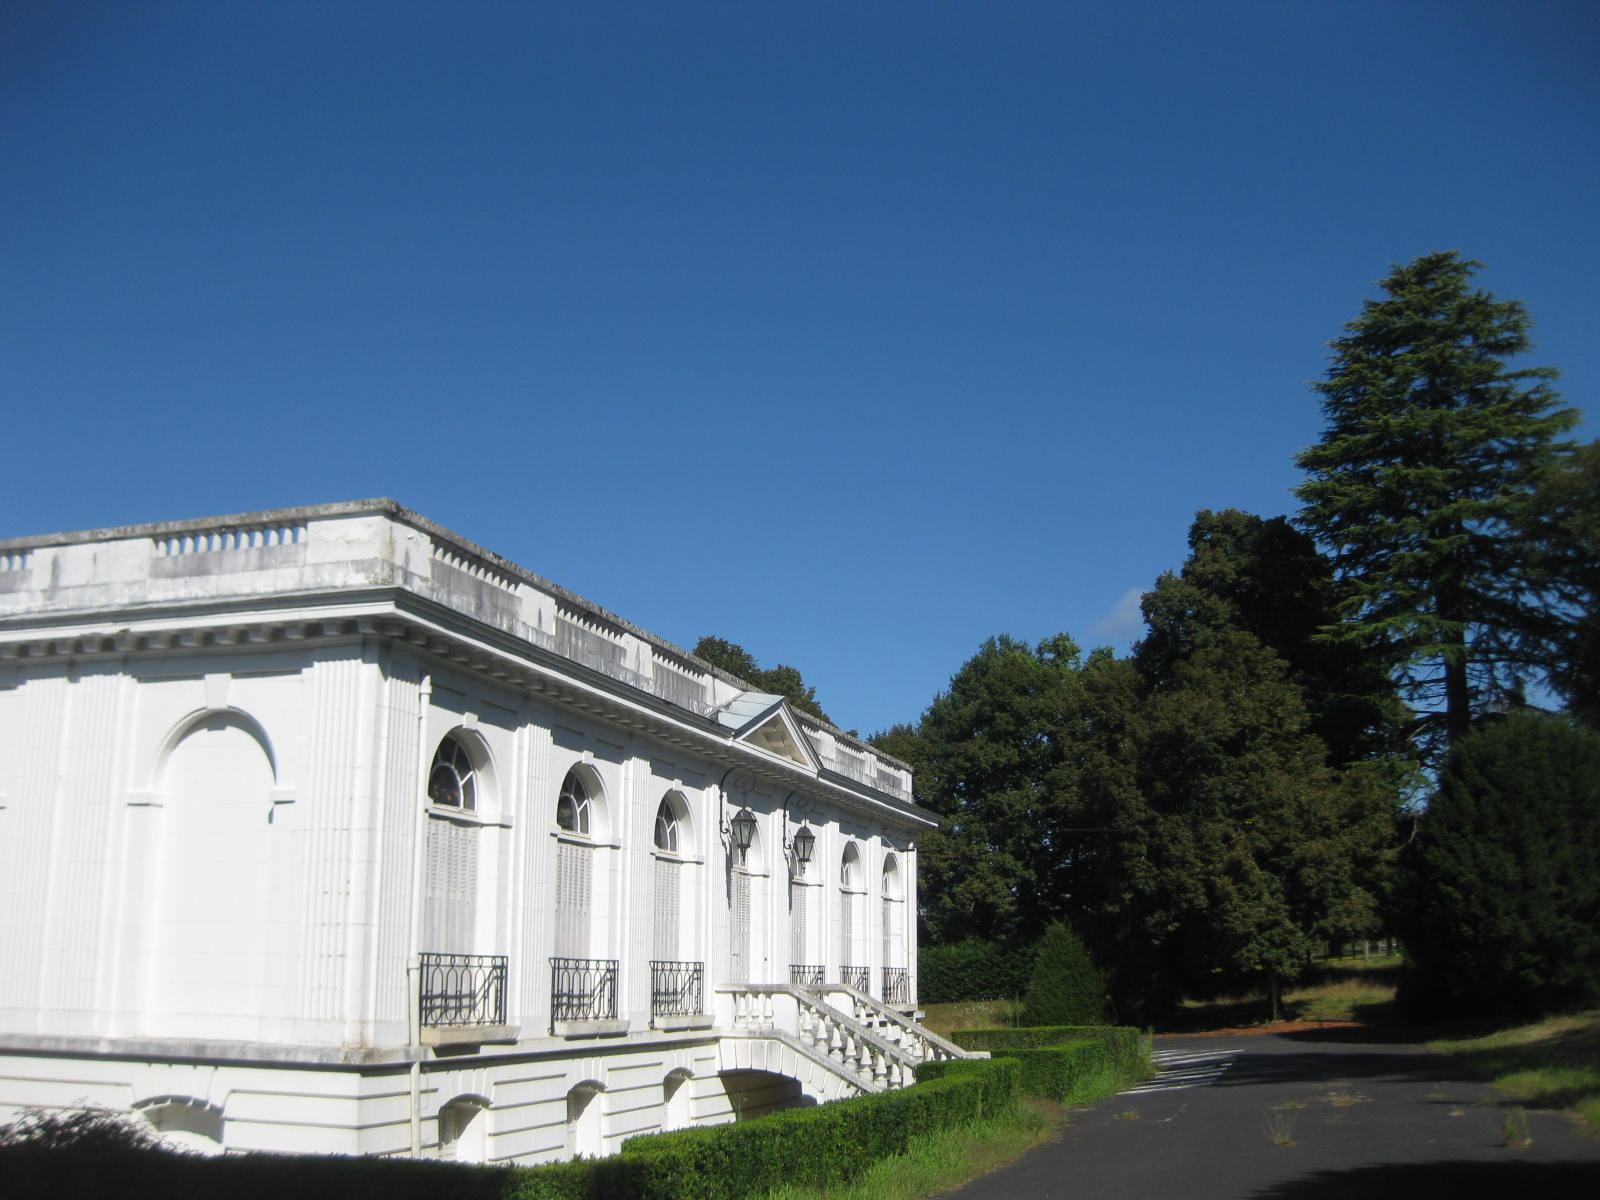 Jumilhac château d'Oche 5